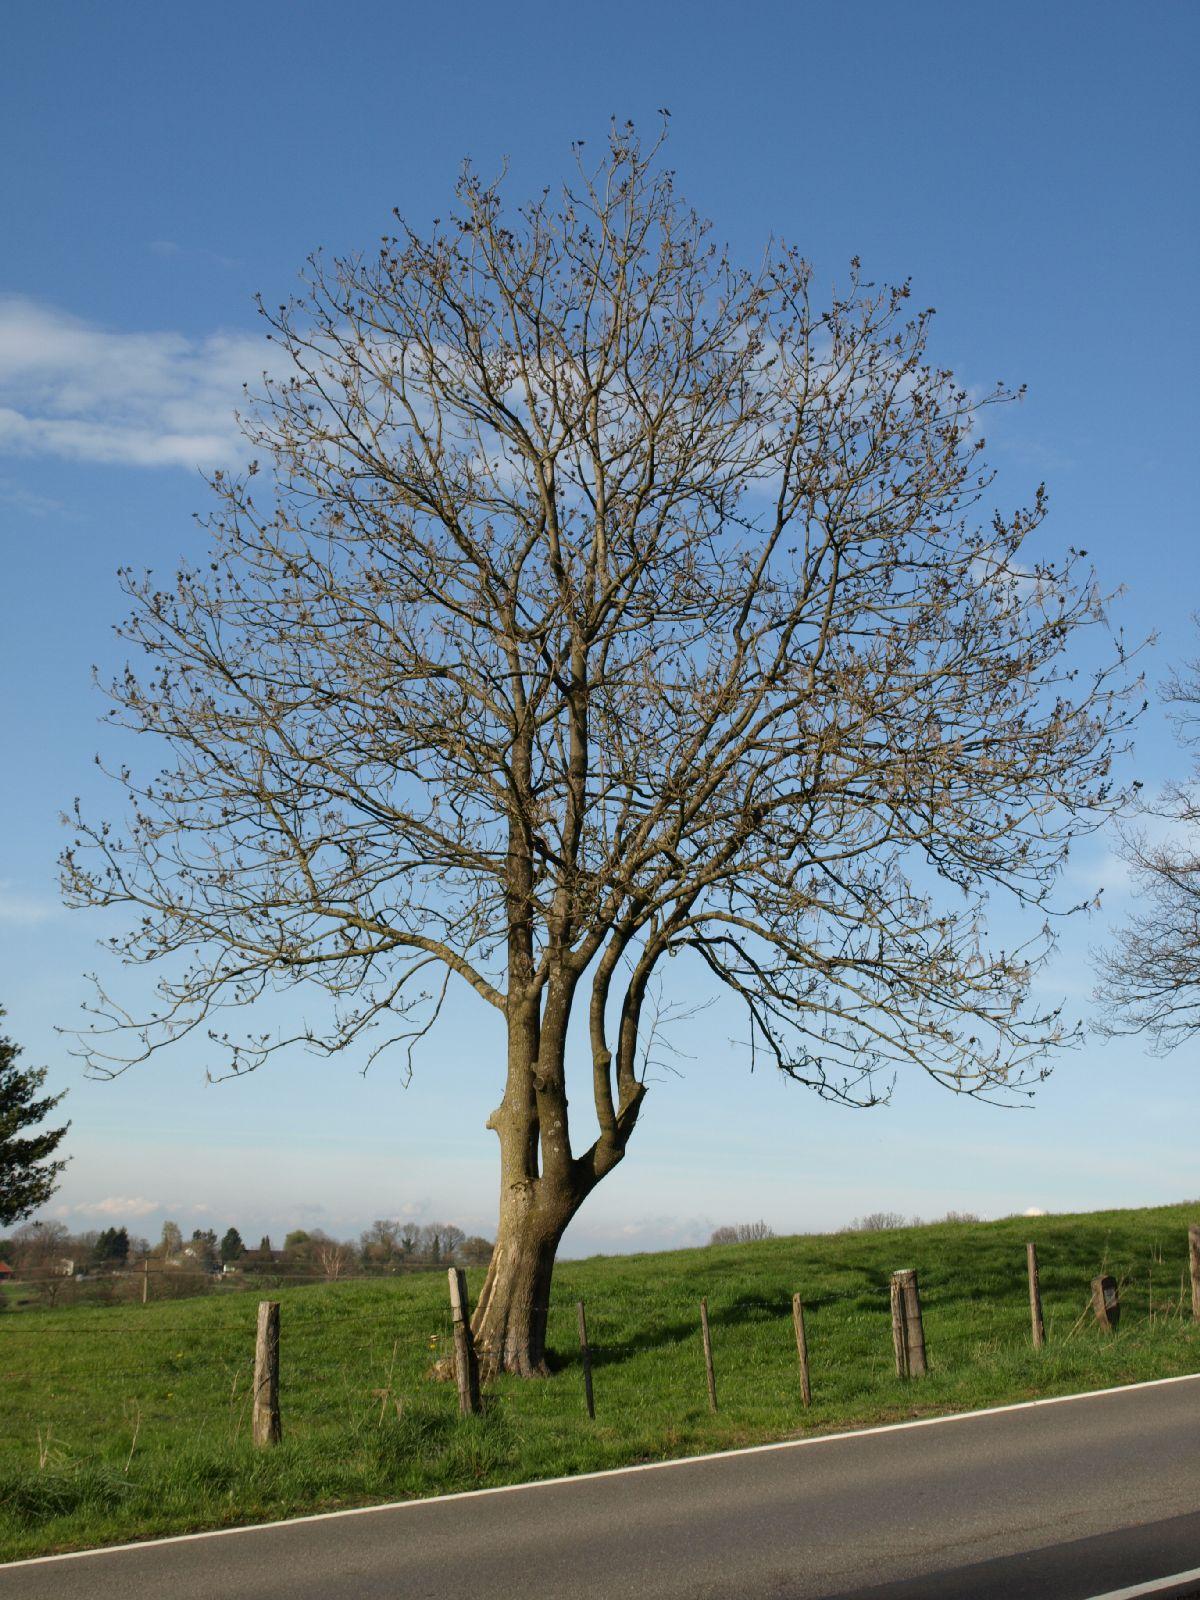 Pflanzen-Baum-Silhouette-Foto_Textur_B_P4201571